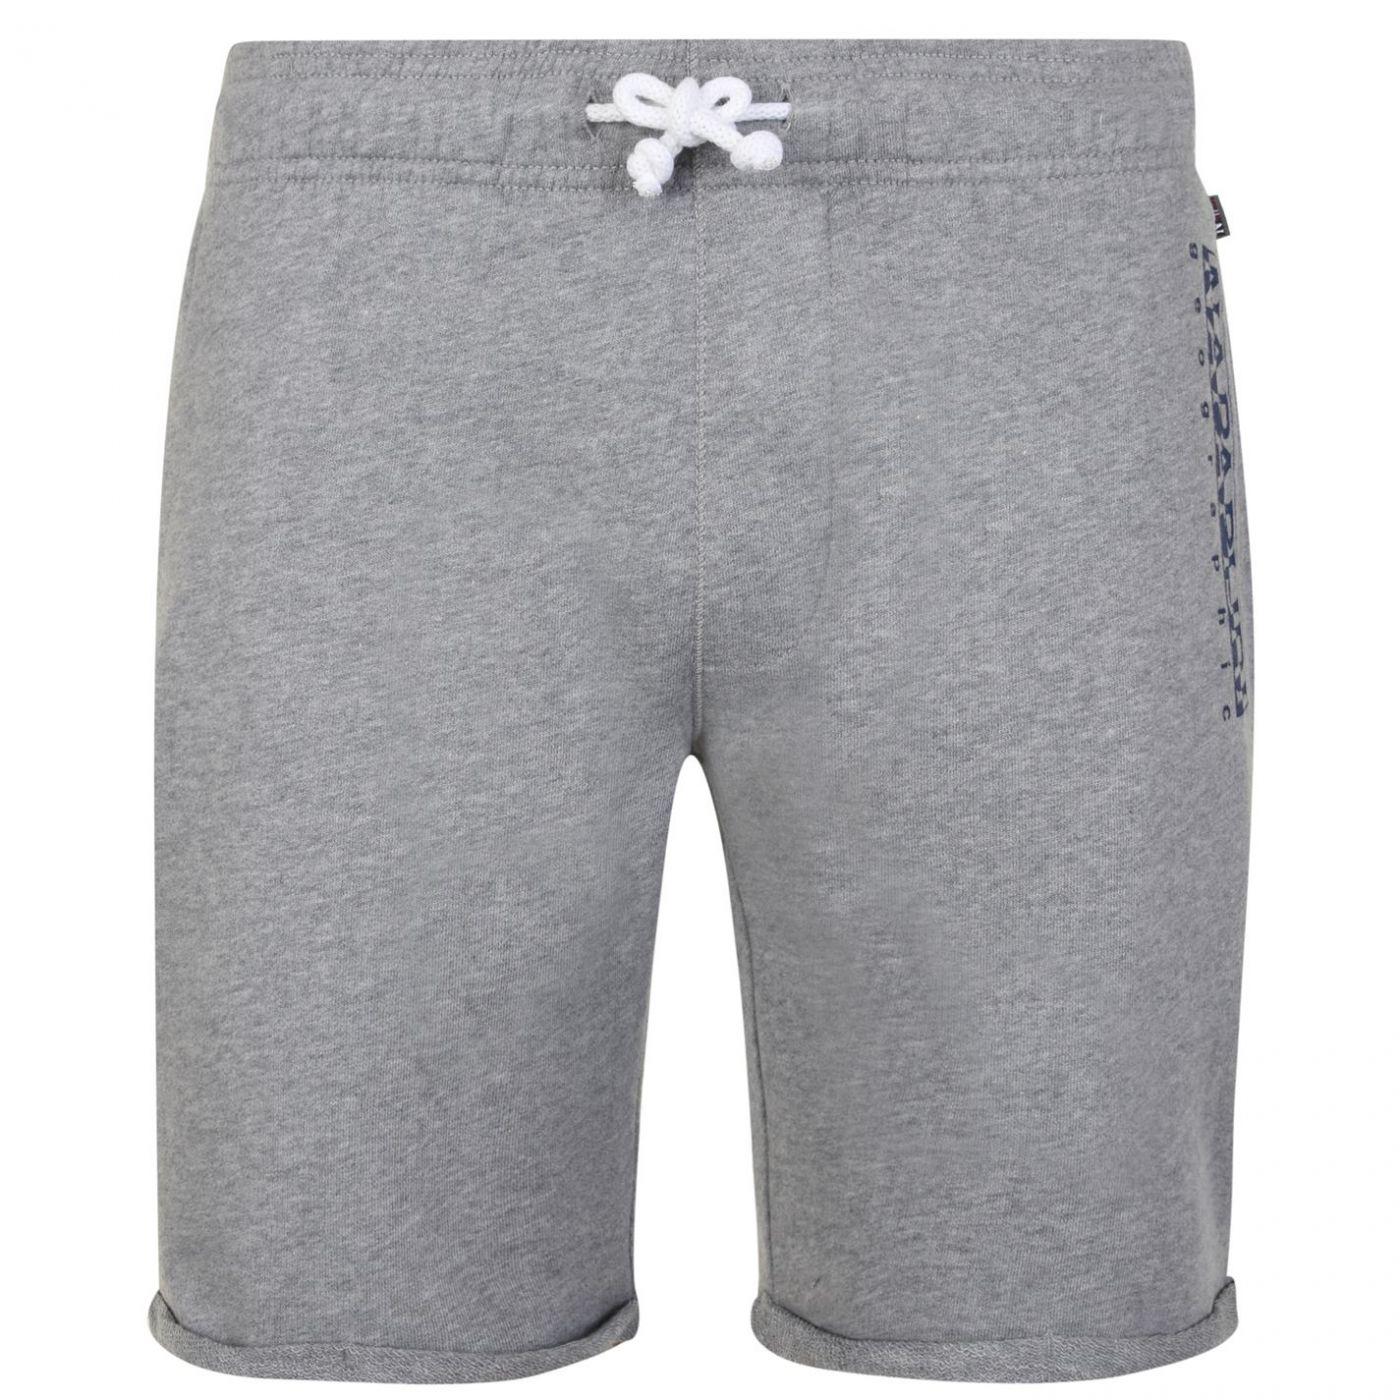 Napapijri Turn Up Shorts